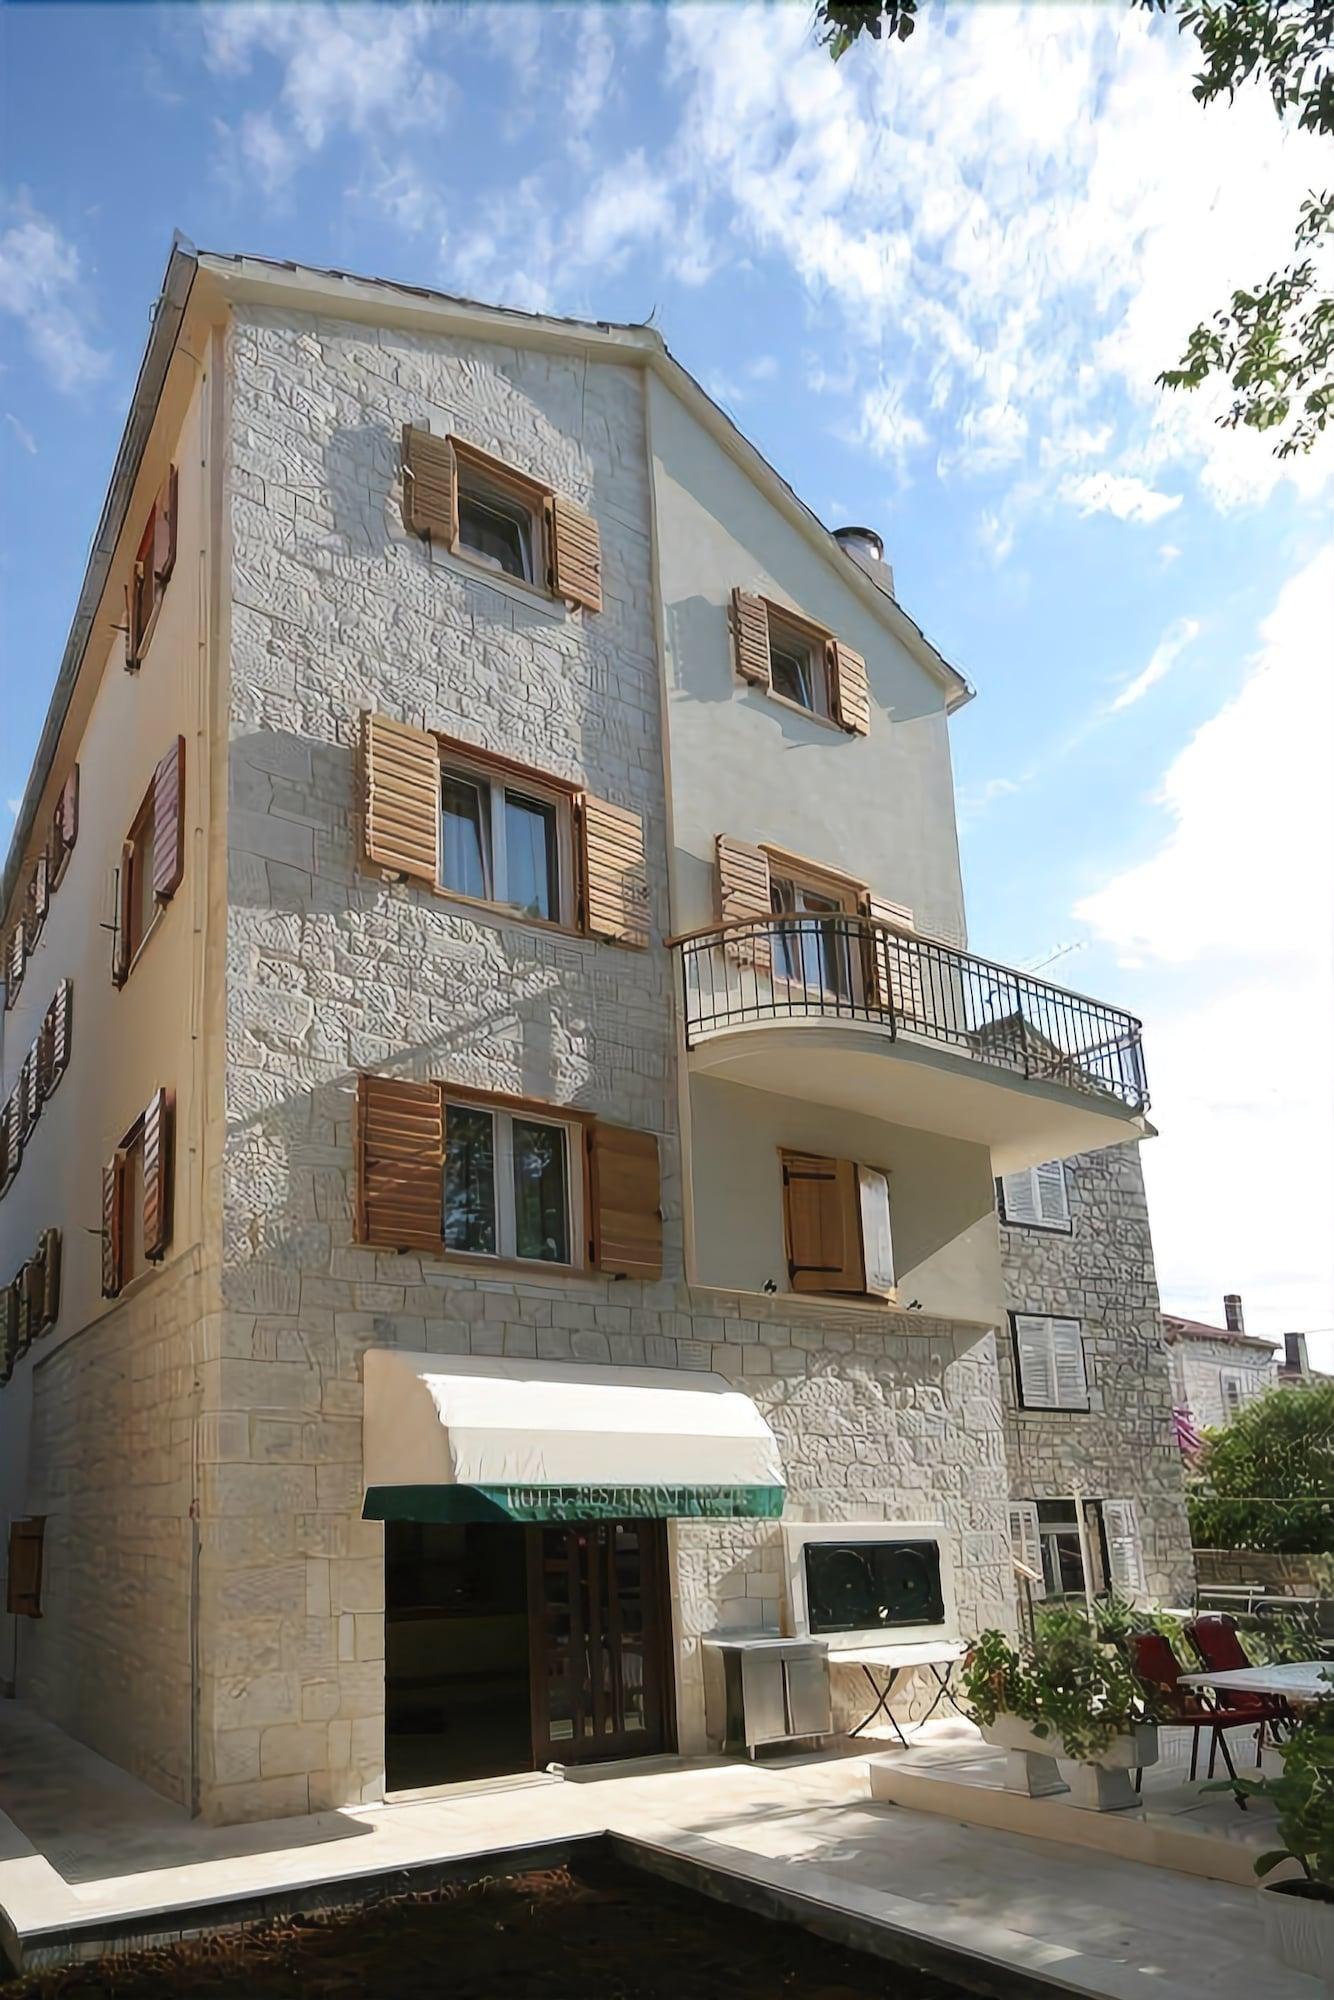 Hotel Trogirski Dvori, Trogir